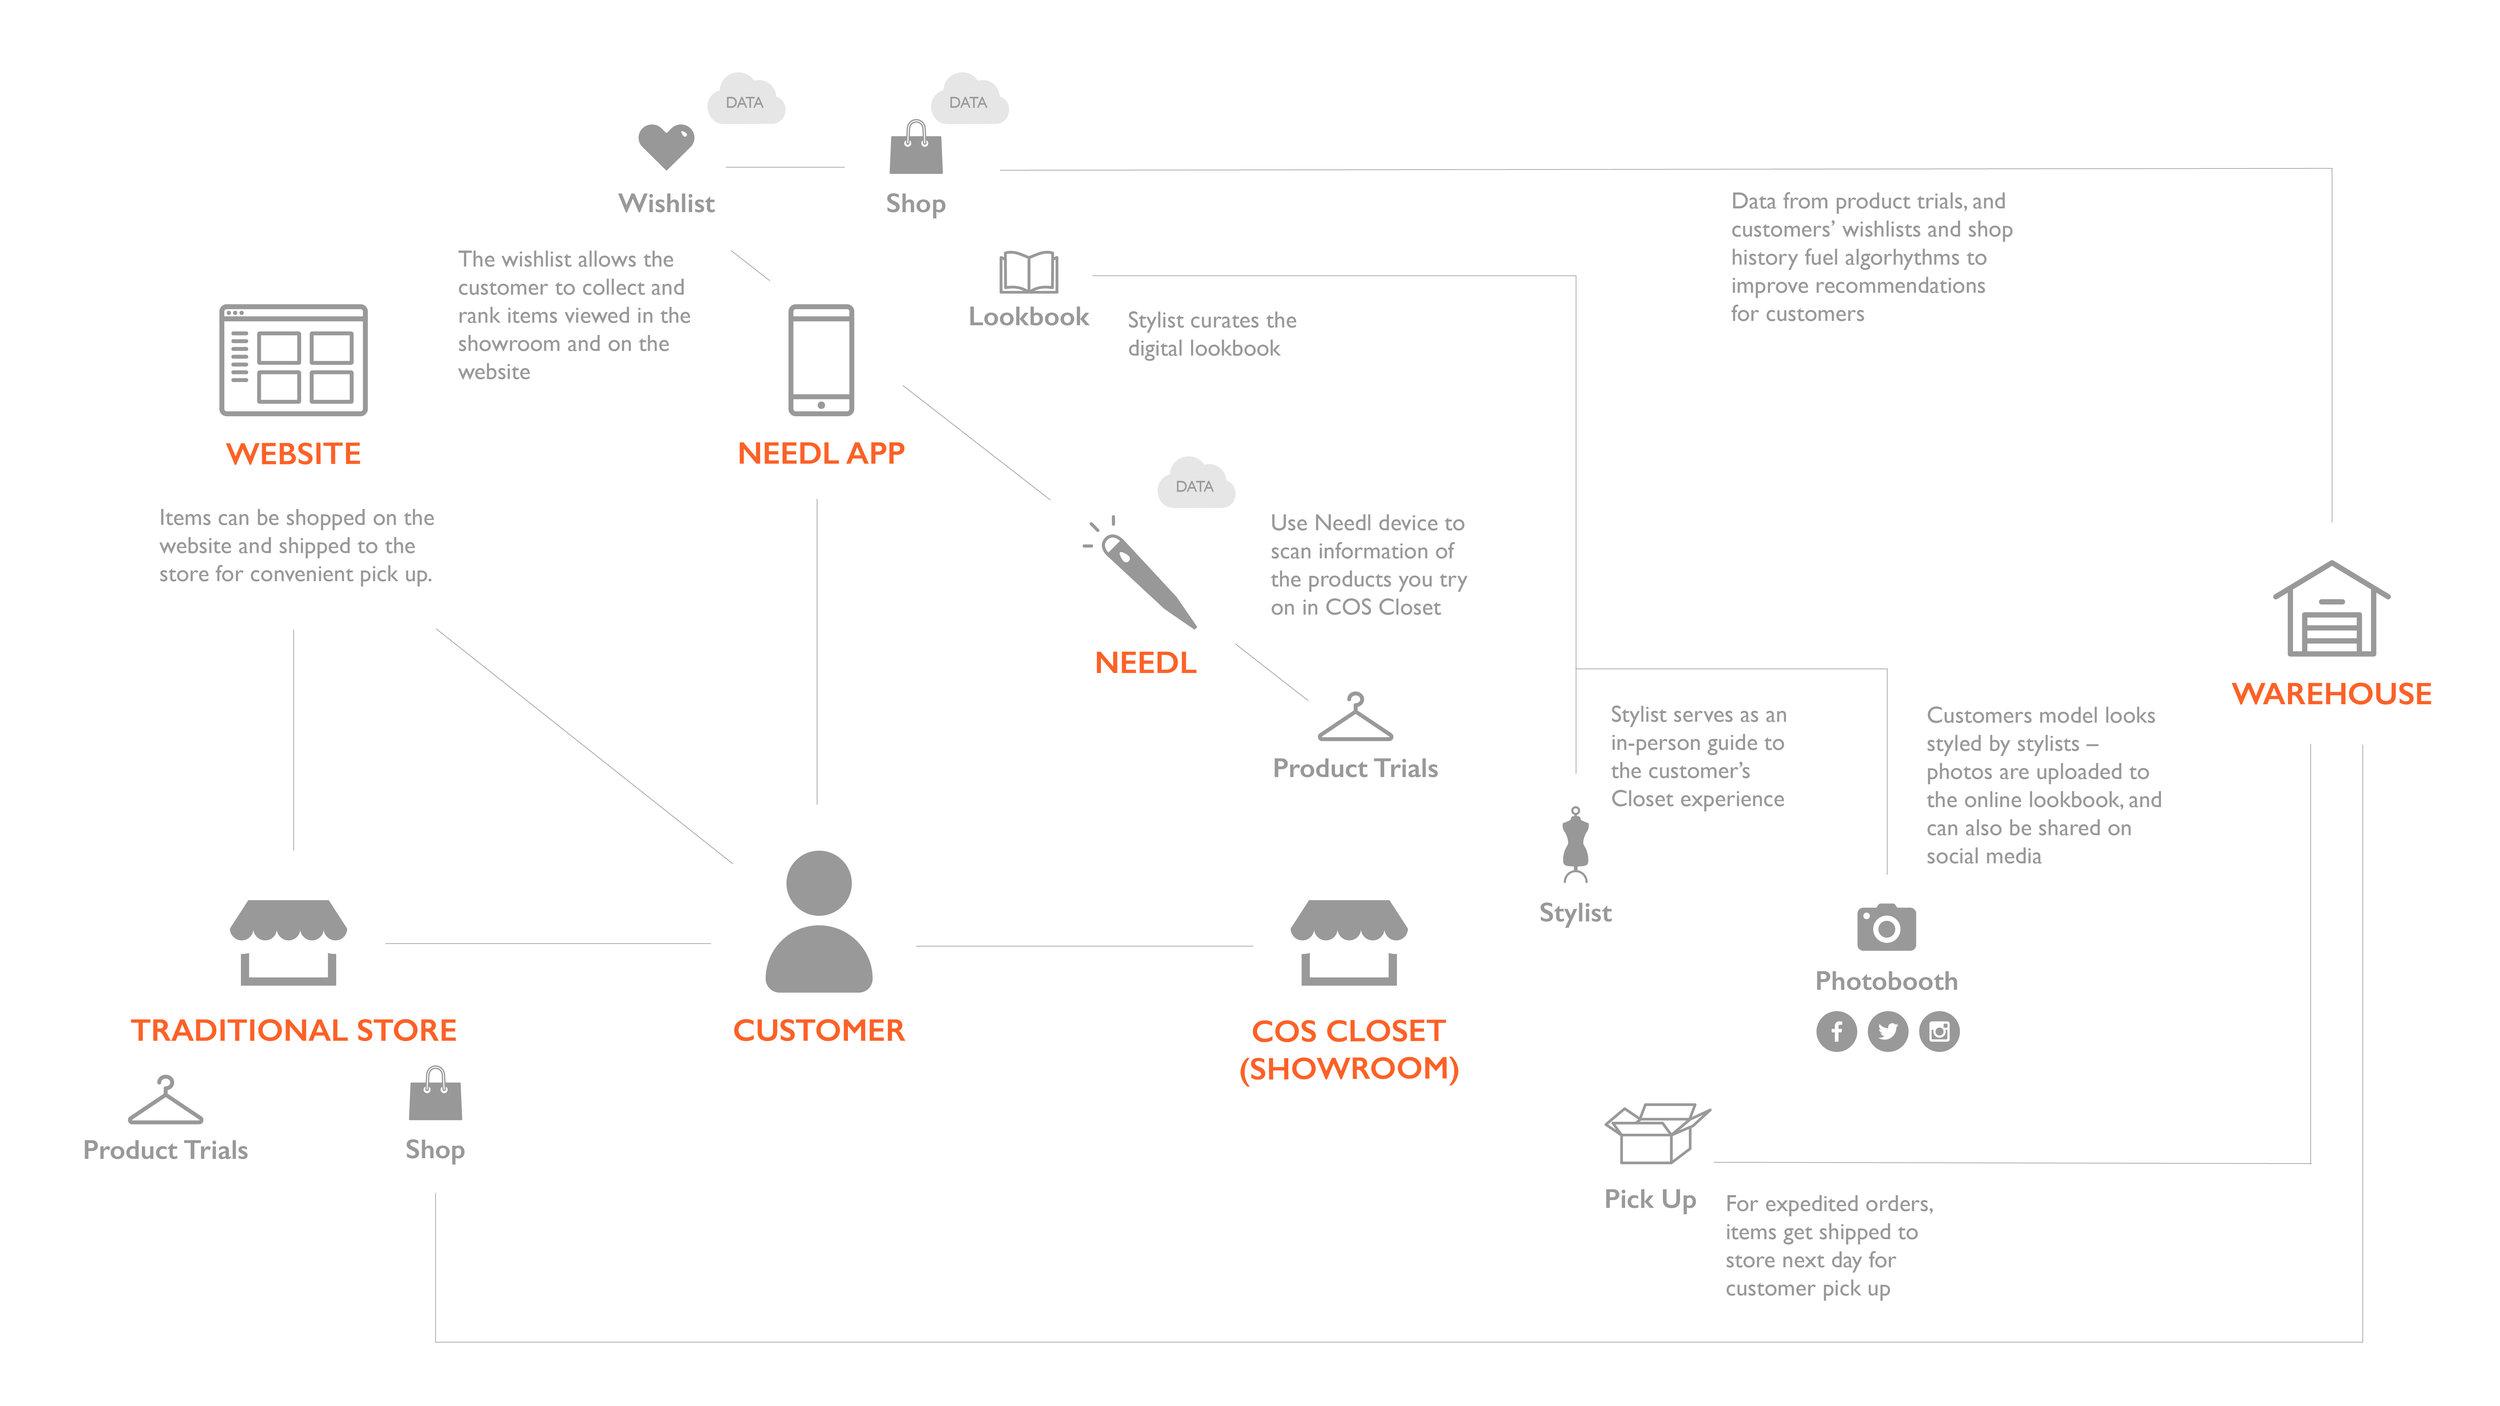 Needl_System's Map.jpg